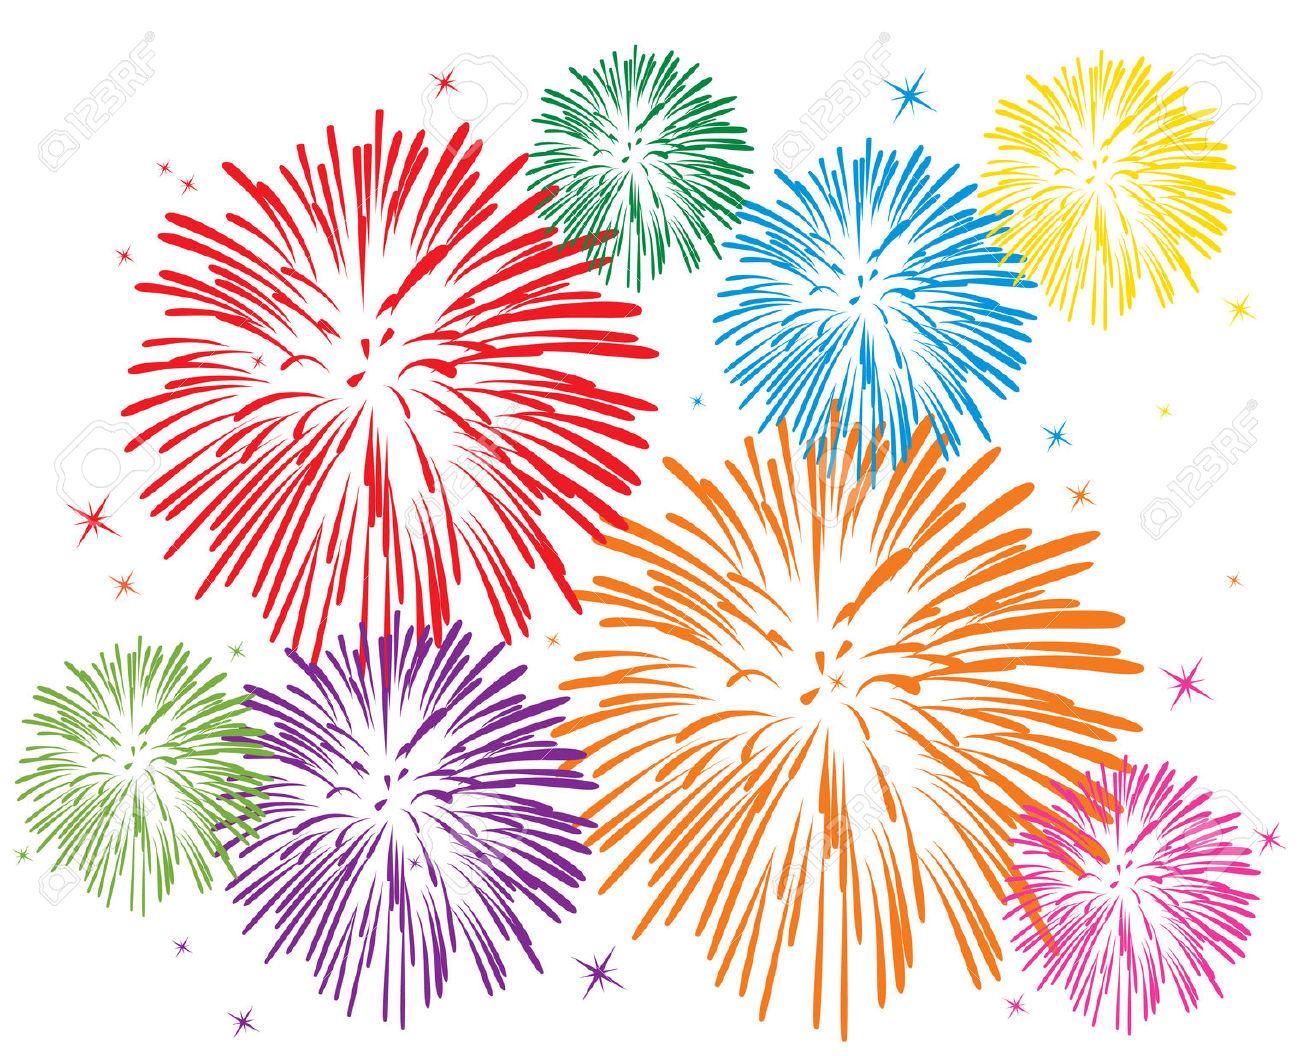 Fireworks Clipart #6726-Fireworks Clipart #6726-11